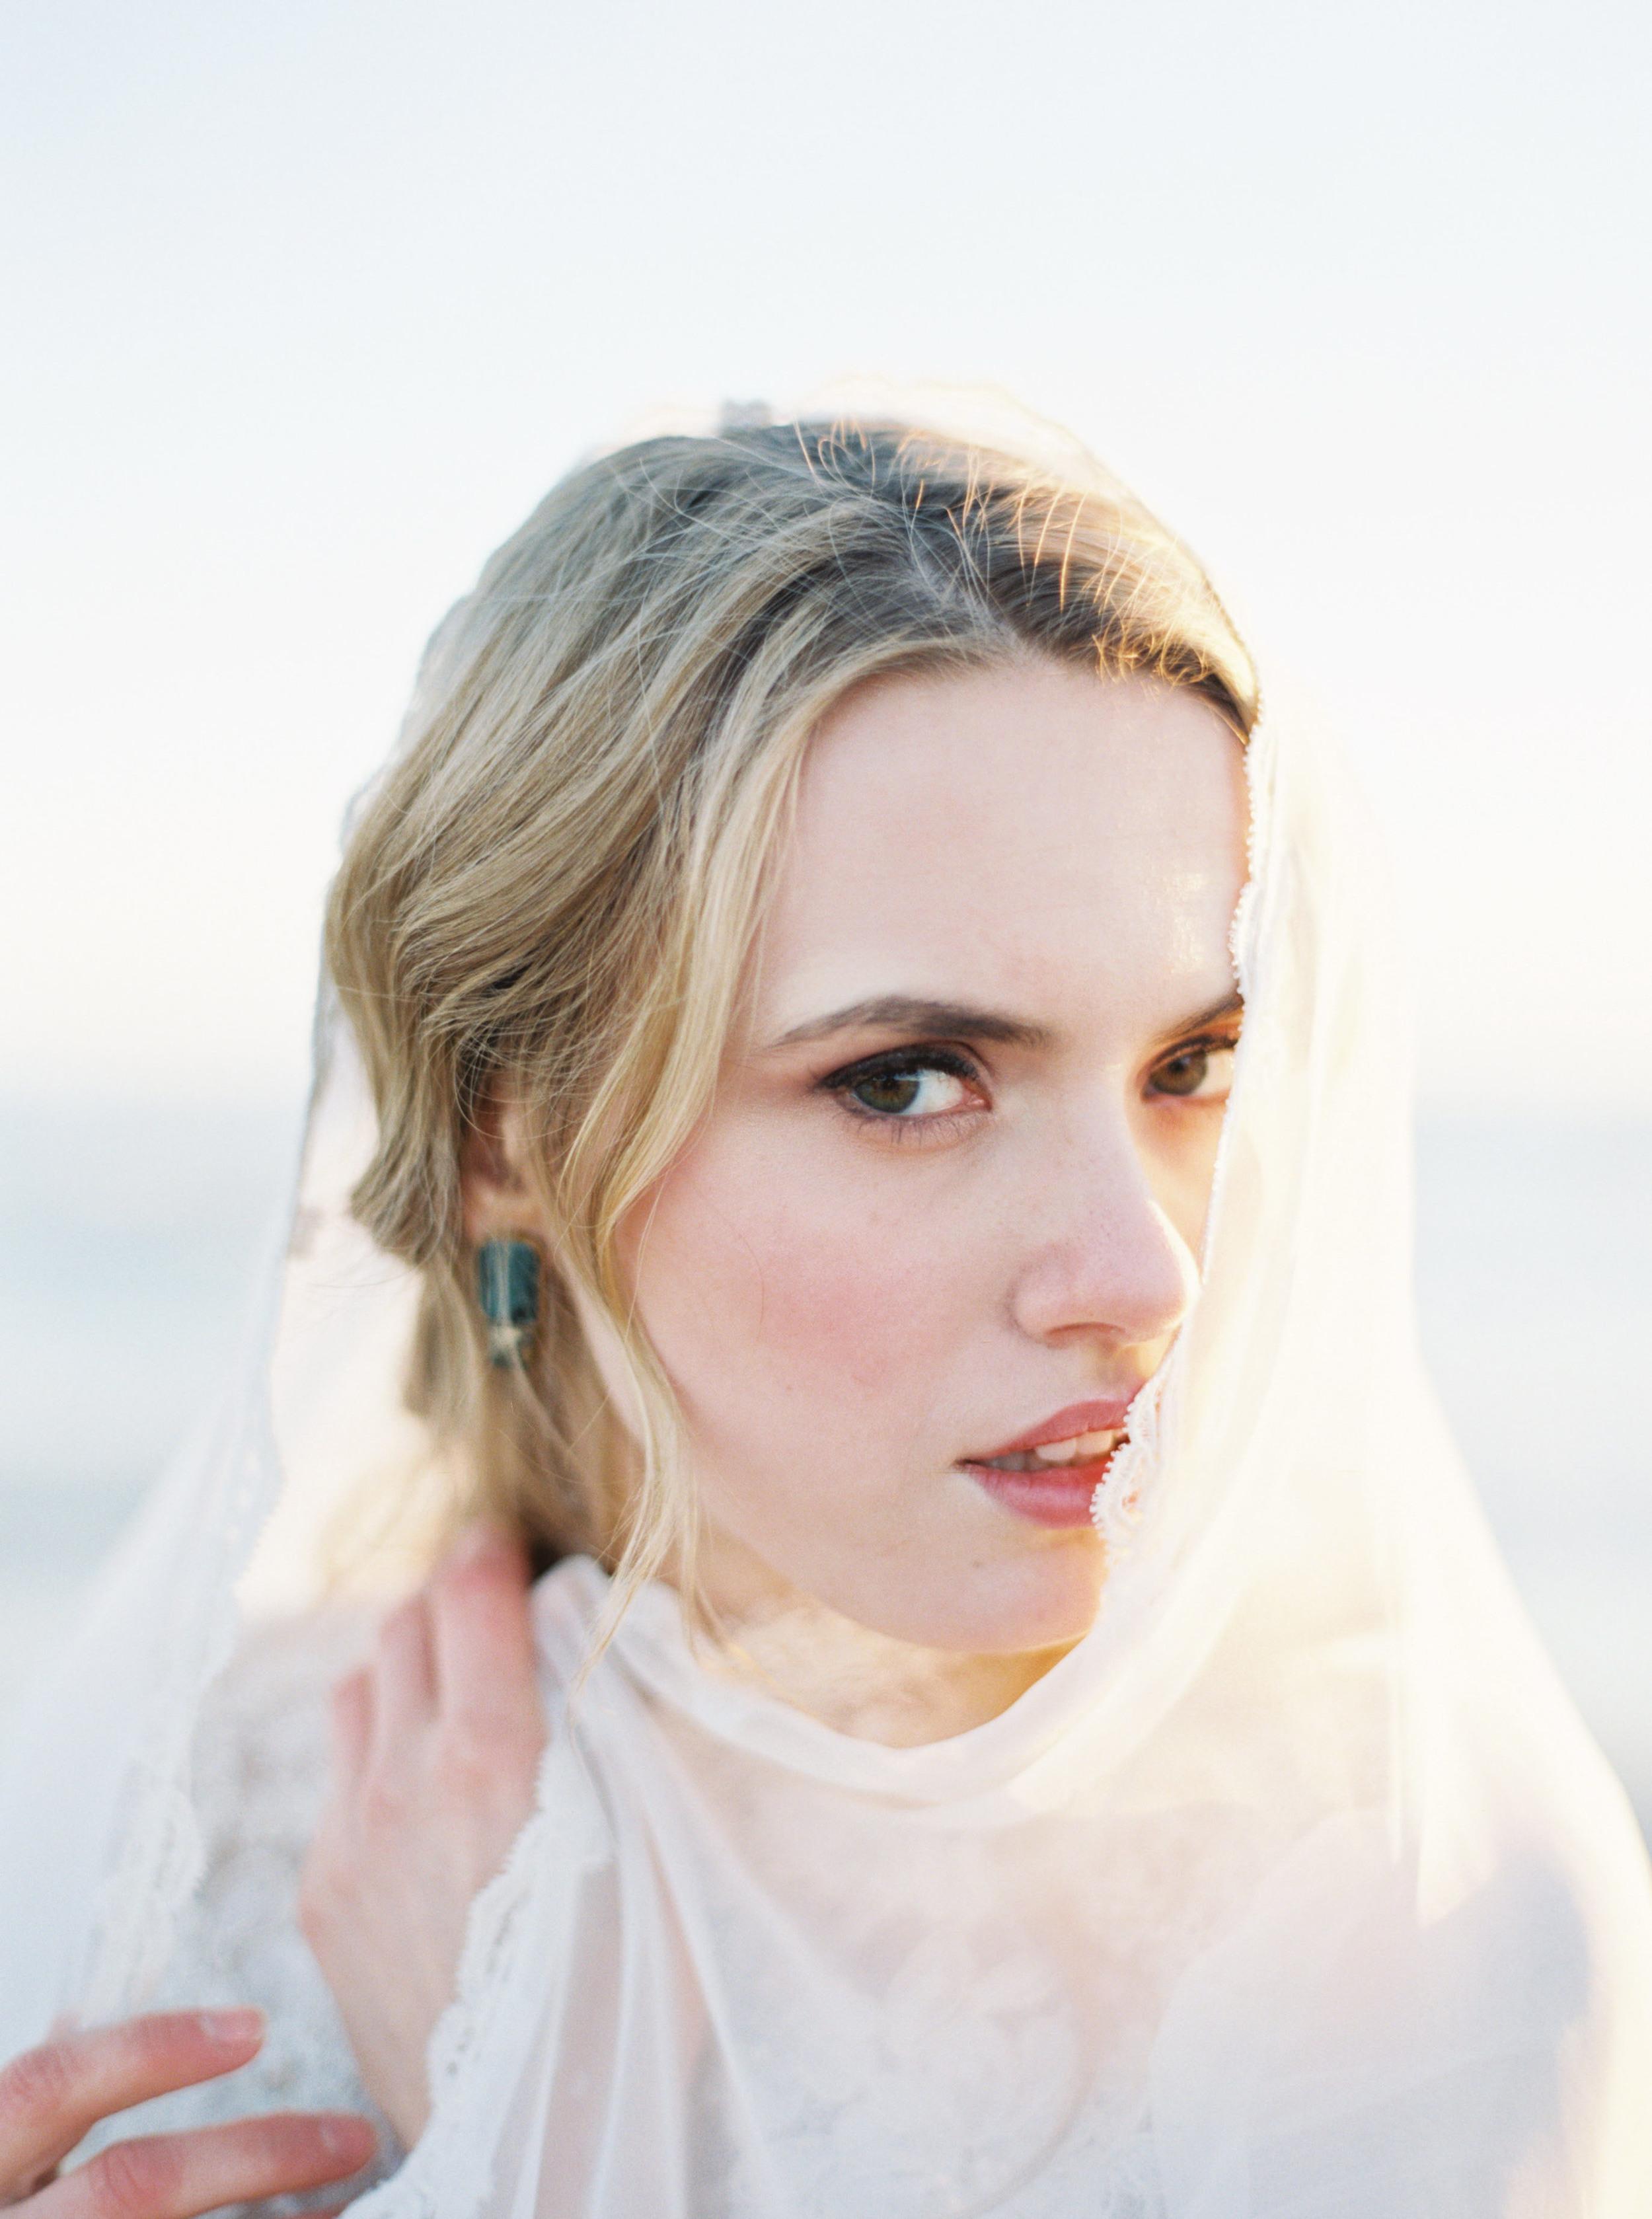 Kyle John l Fine Art Wedding Photography l Chicago, Copenhagen, California, New York, Destination l Blog l Sea and Sand_9